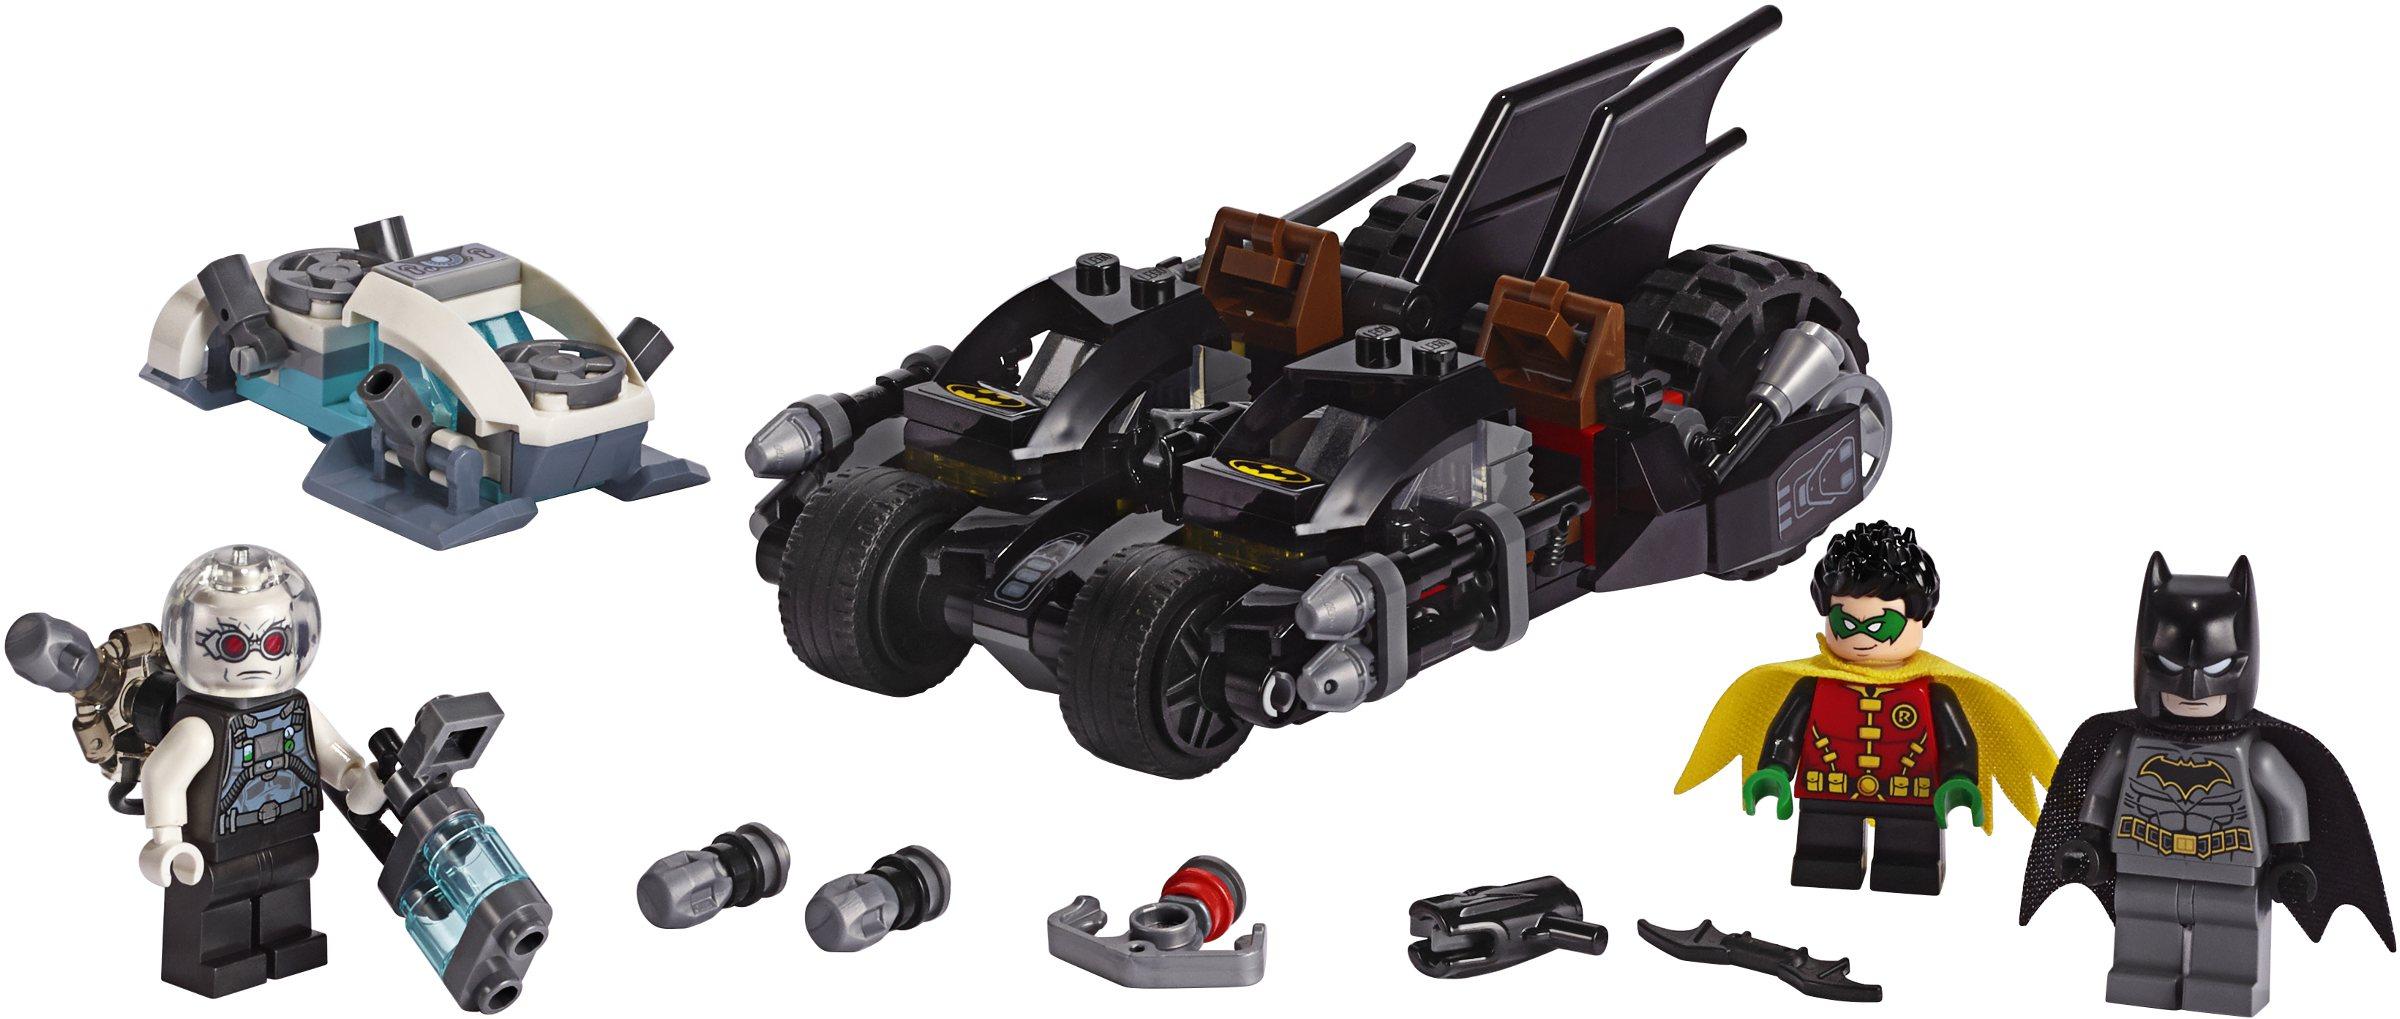 Lego 4x Minifig Weapon Weapon Bat-A-Rang Batman Silver//Flat Silver 98721 New